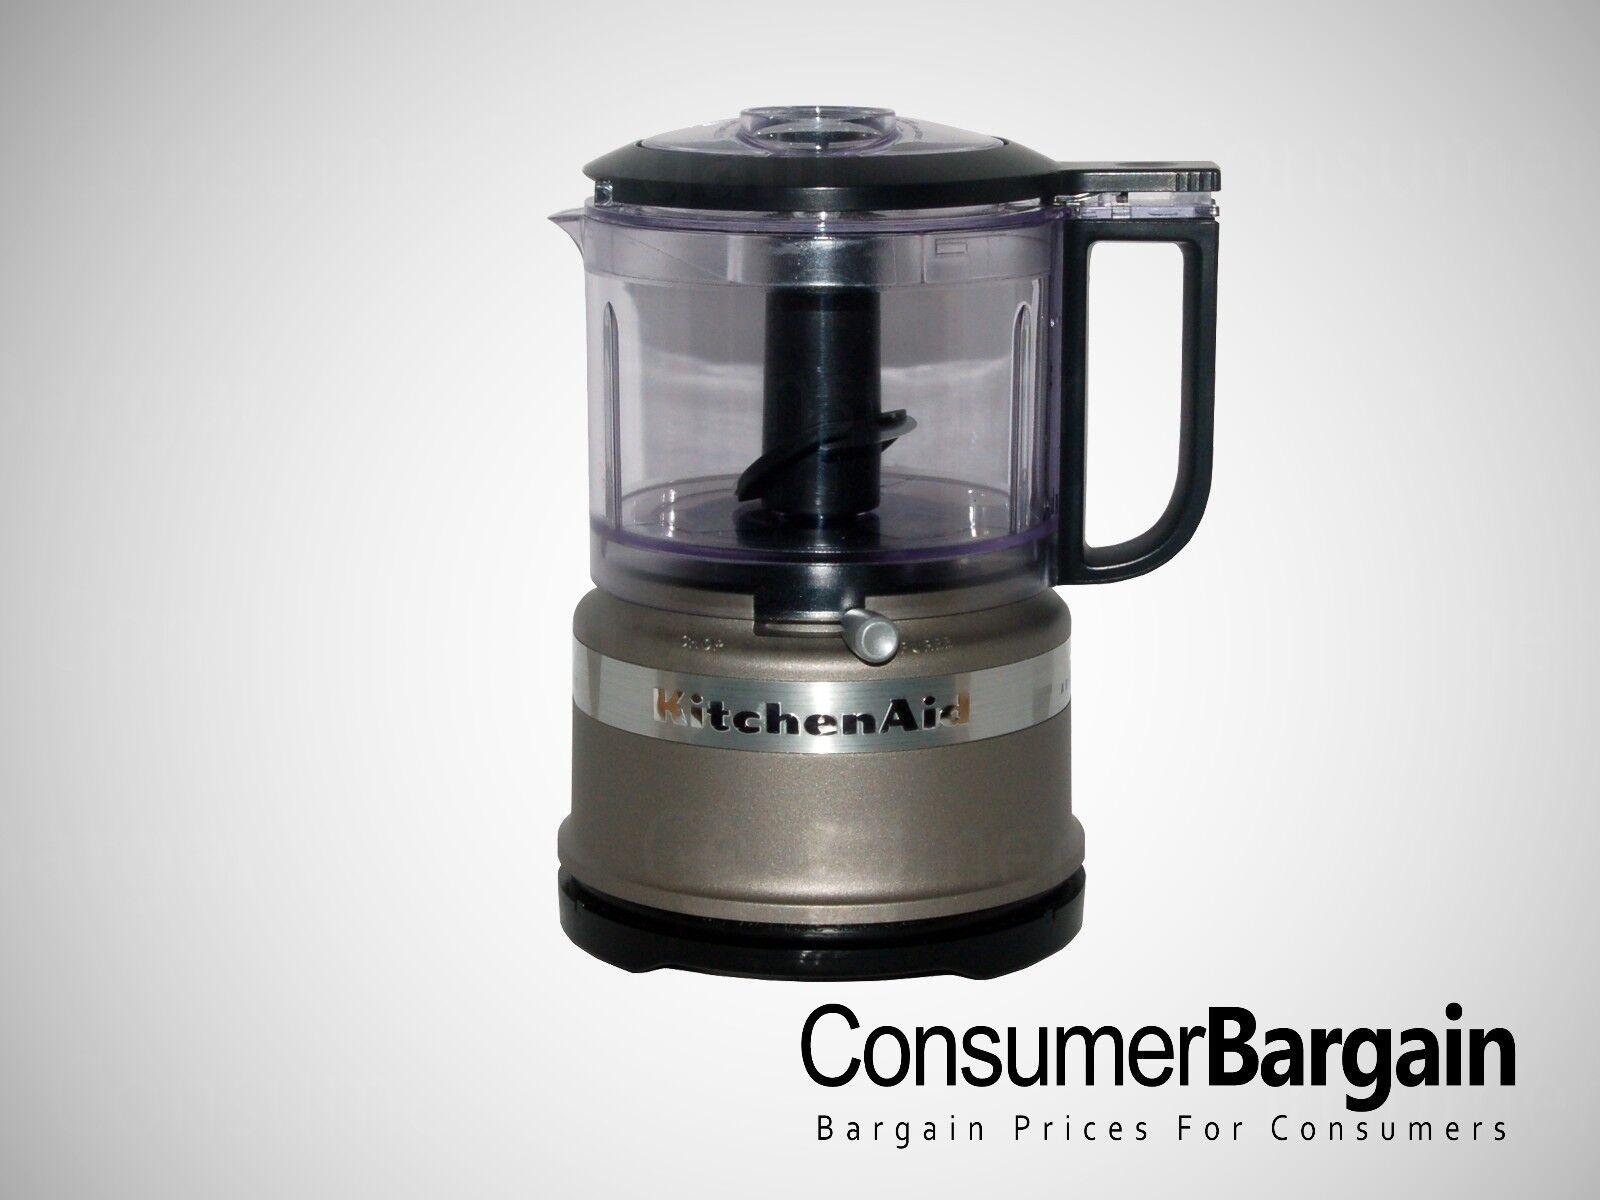 Details about KitchenAid KFC3516CS 3.5 Cup Mini Food Processor Guaranteed  Refurbished BPA-Free